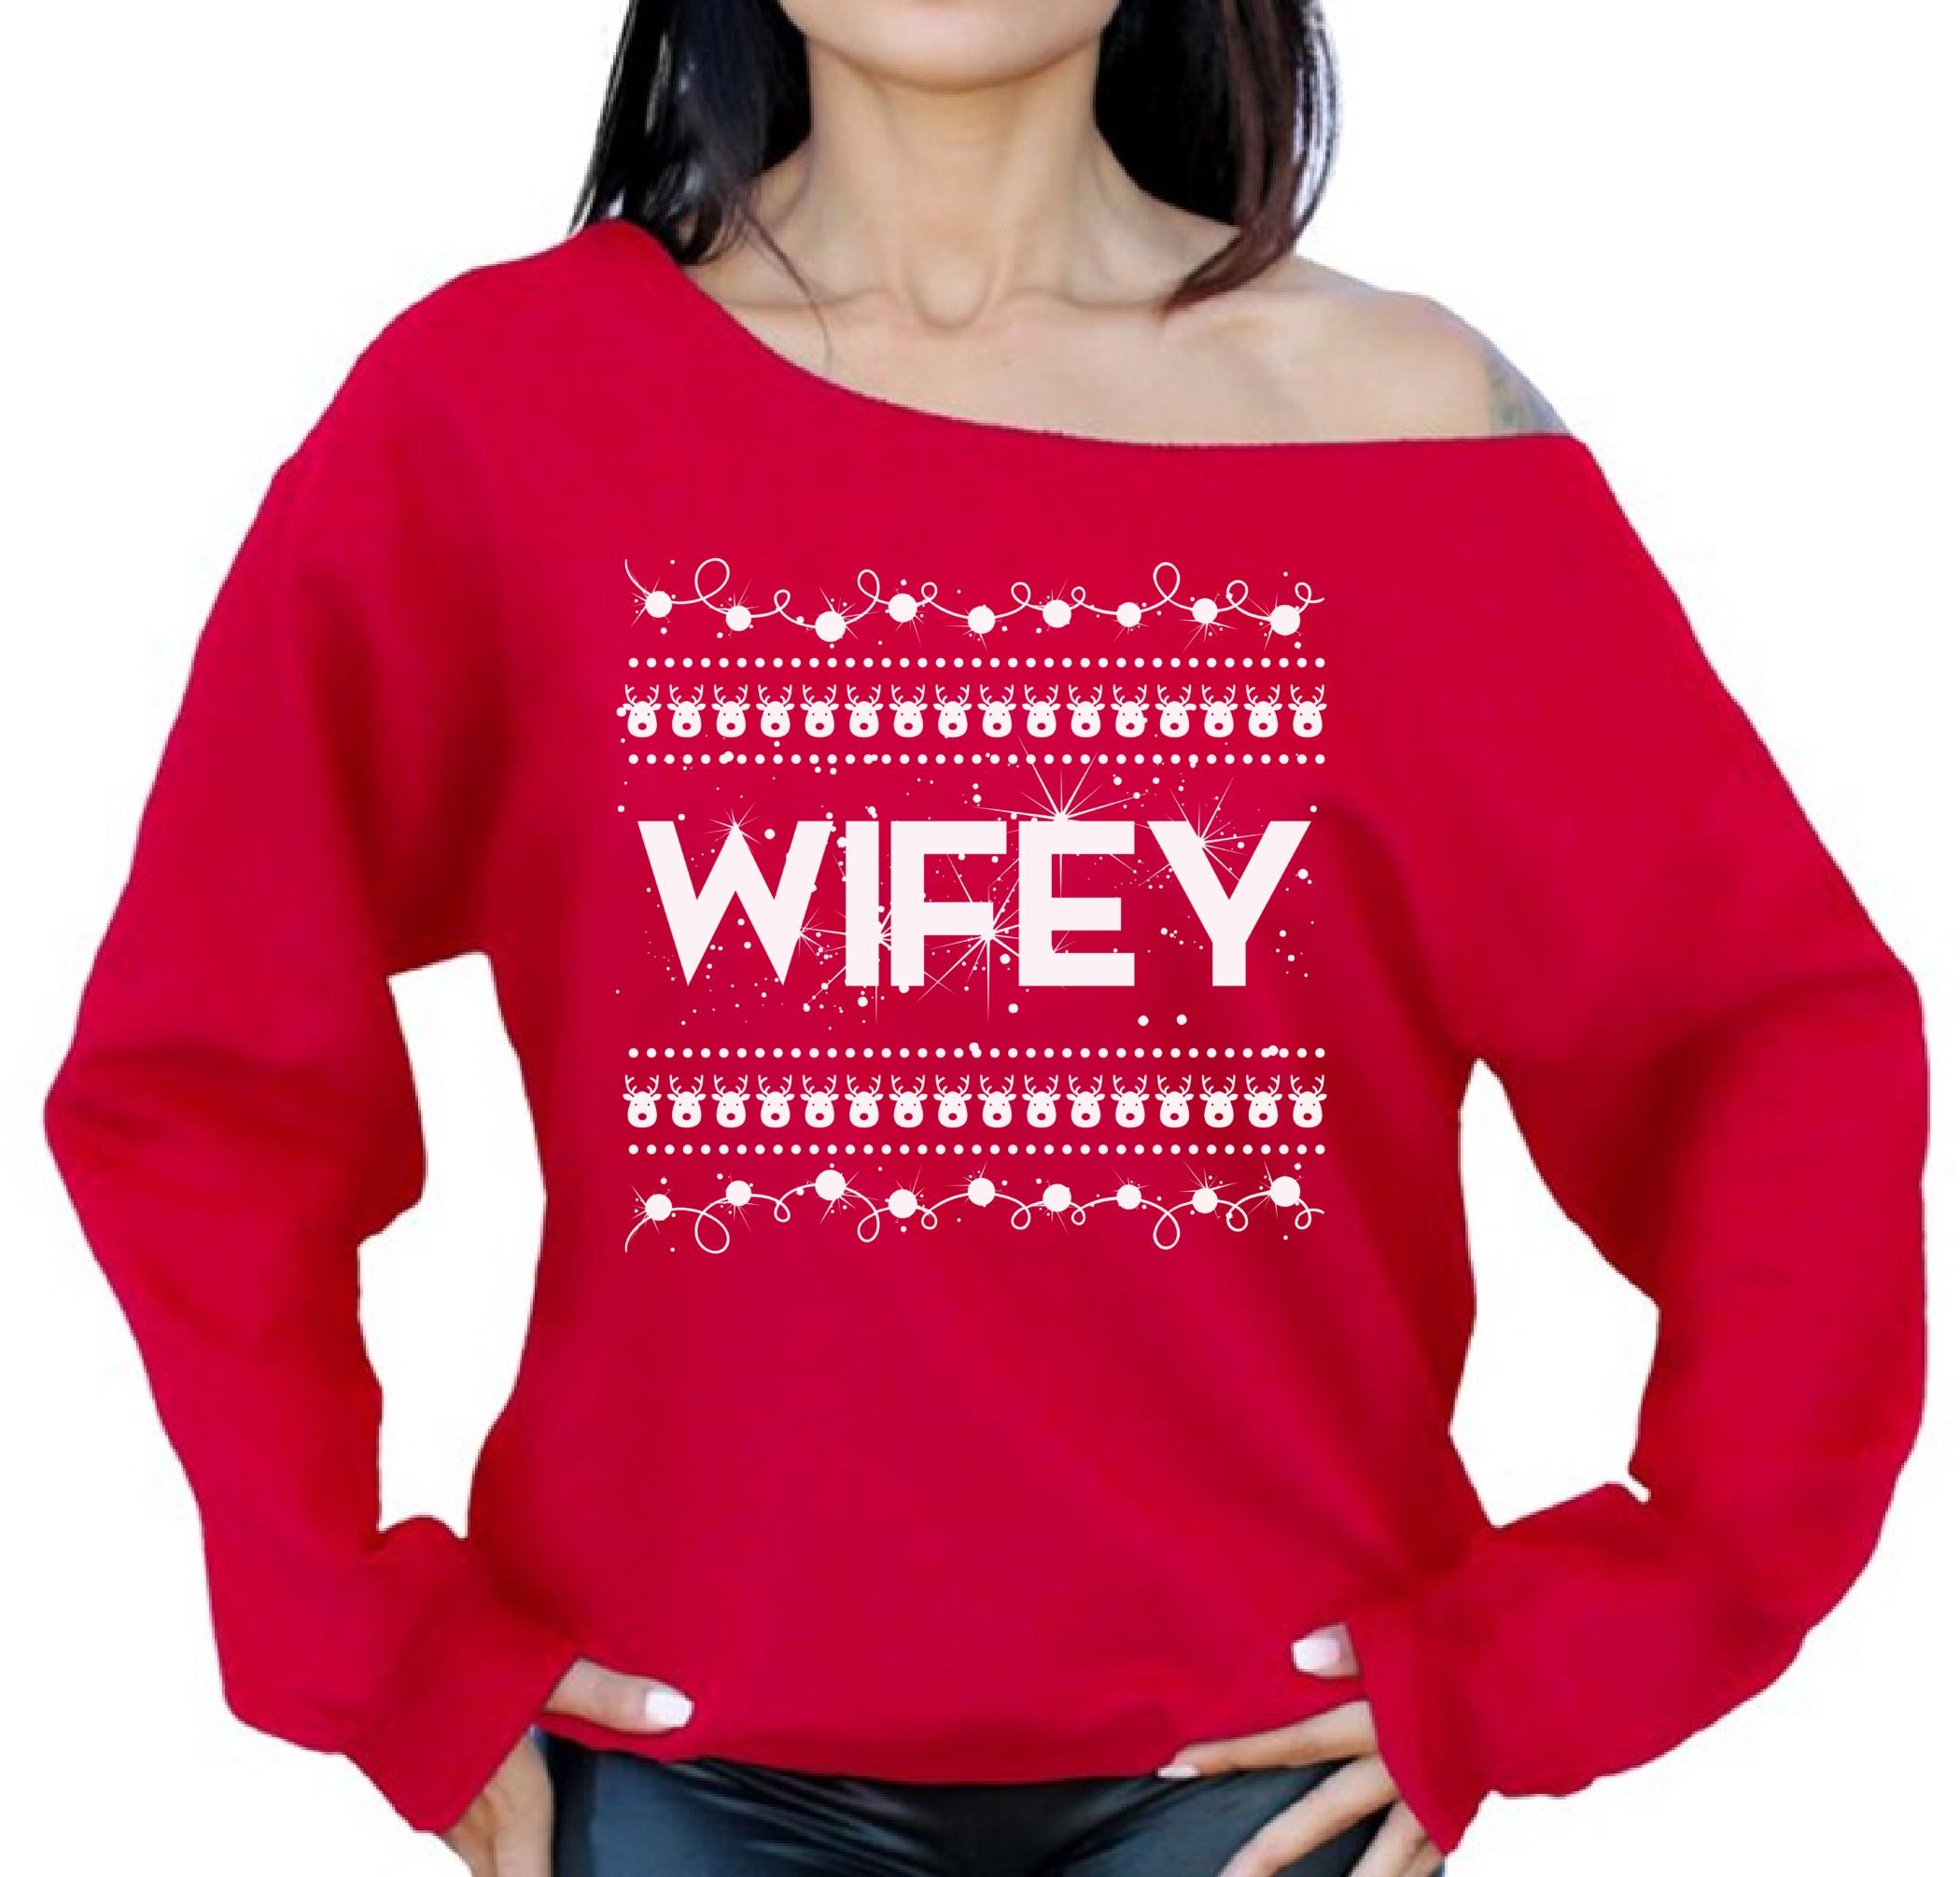 Wifey Sweatshirt Wifey Christmas Sweater Off the Shoulder Top Xmas ...